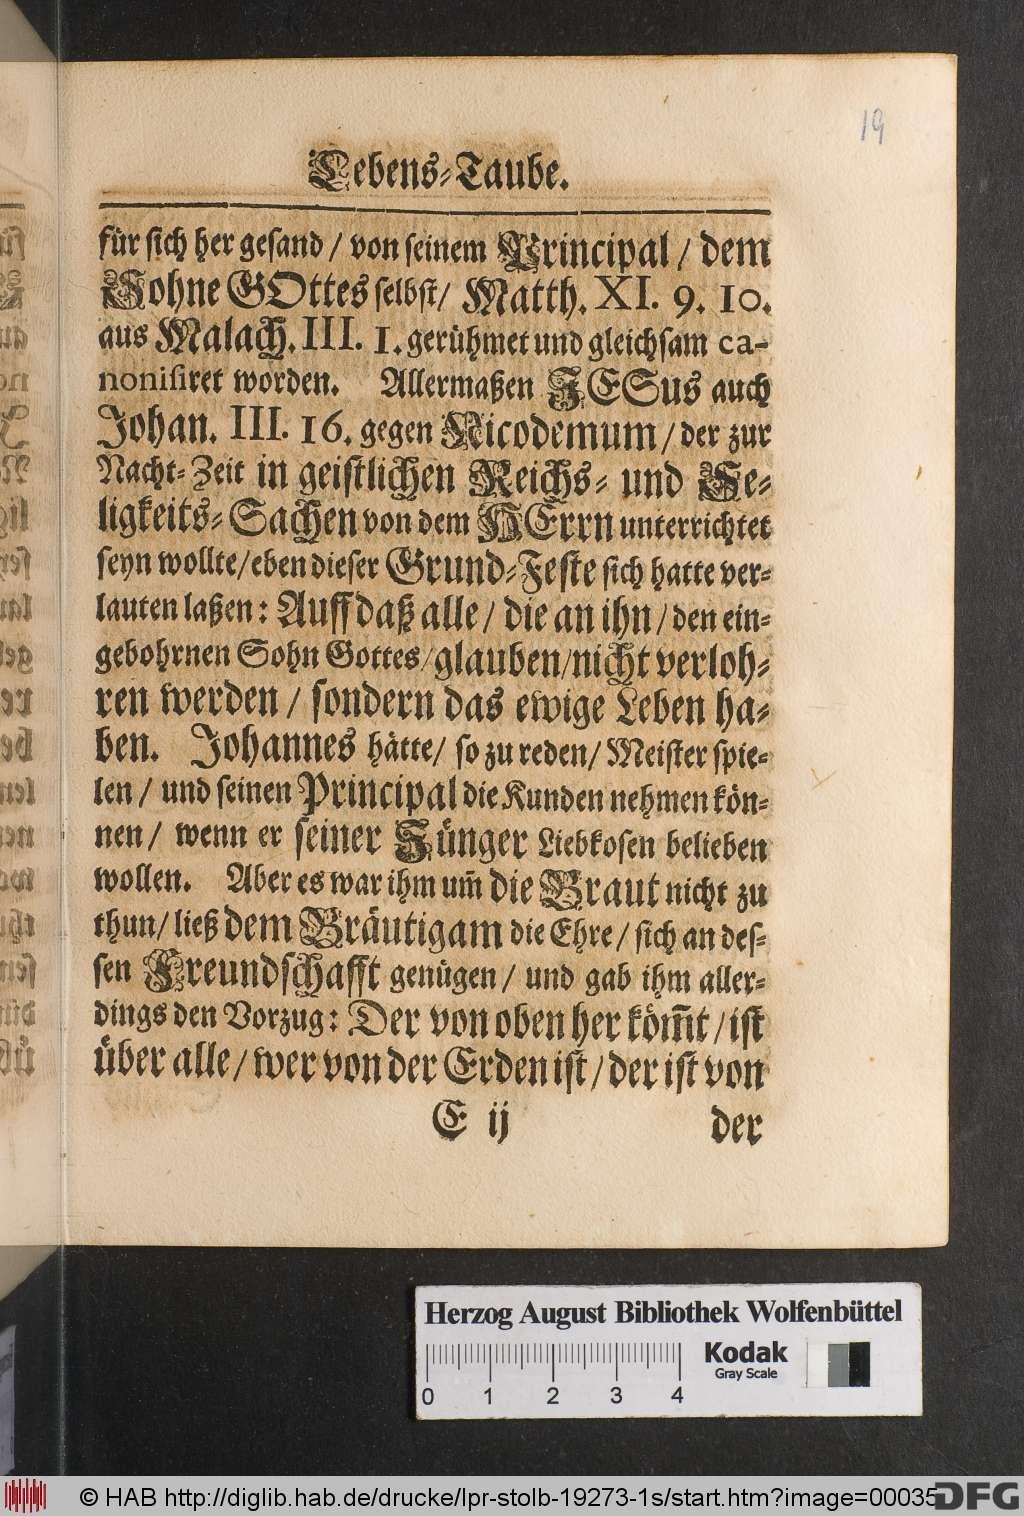 http://diglib.hab.de/drucke/lpr-stolb-19273-1s/00035.jpg